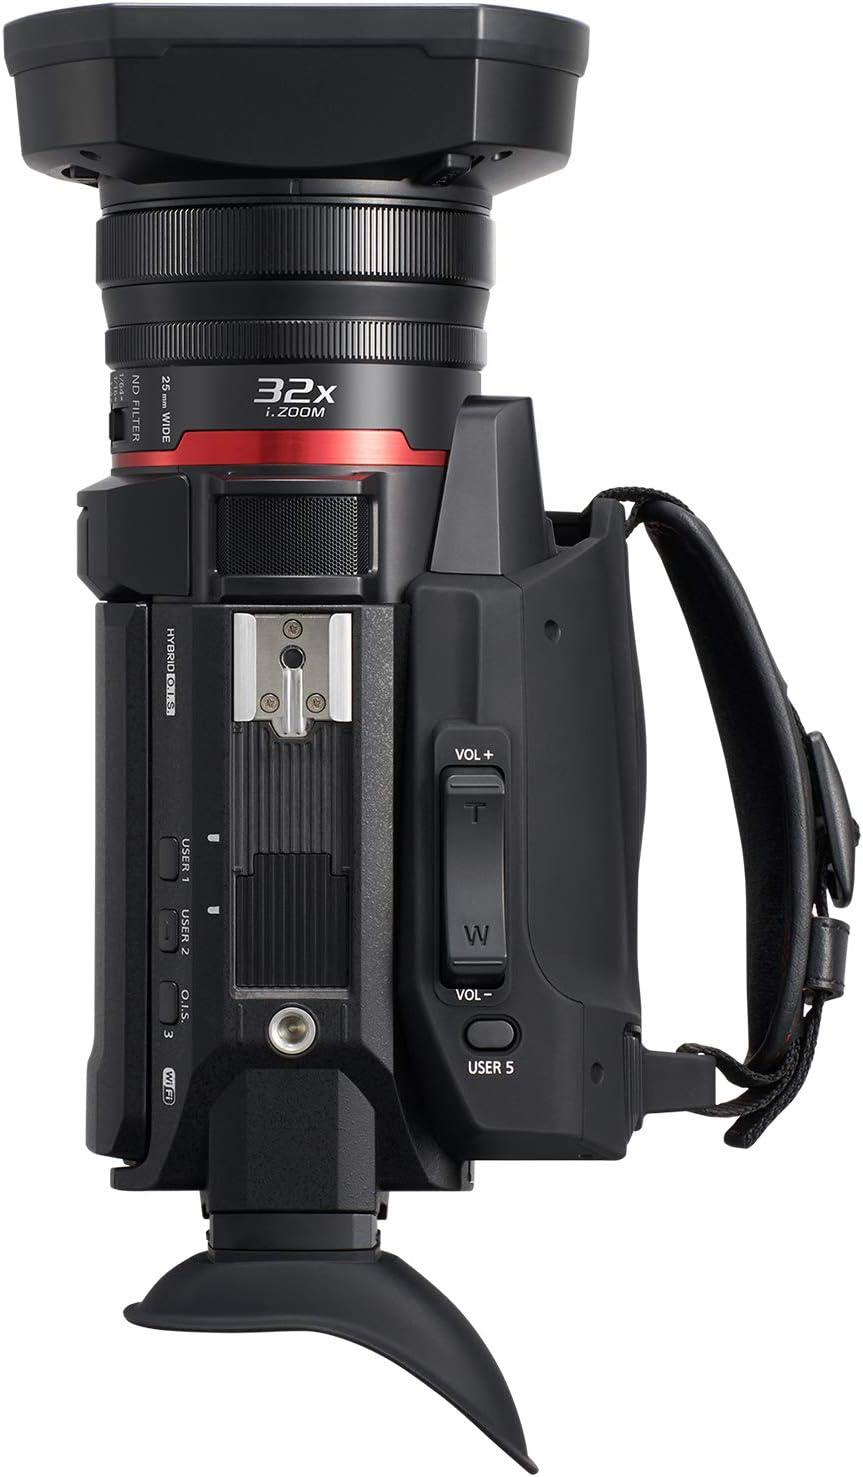 USA Black HC-X1500 WiFi HD Live Streaming Panasonic X1500 4K Professional Camcorder with 24X Optical Zoom